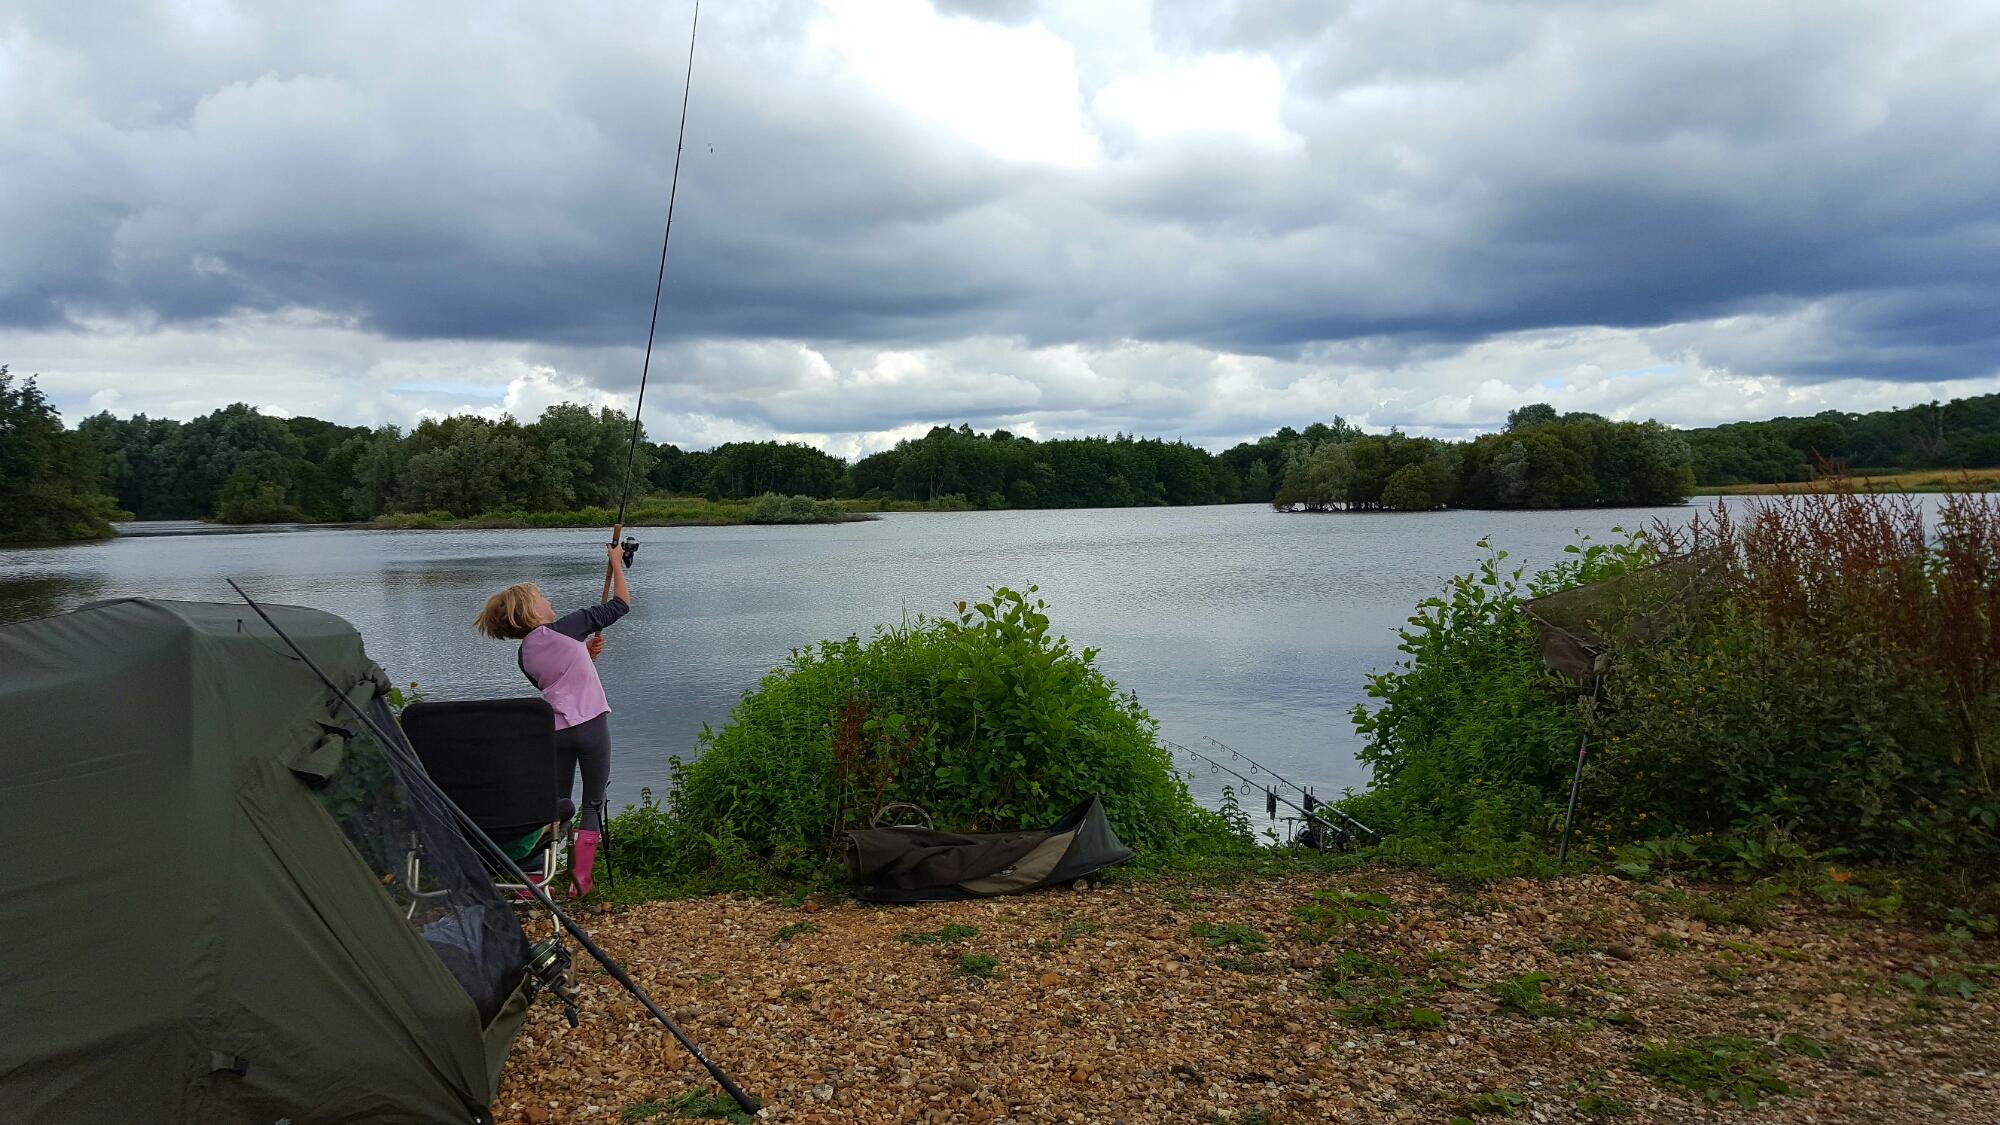 Trip no 93 carp fishing 2016 uk carp coarse fishing for Fishing videos 2016